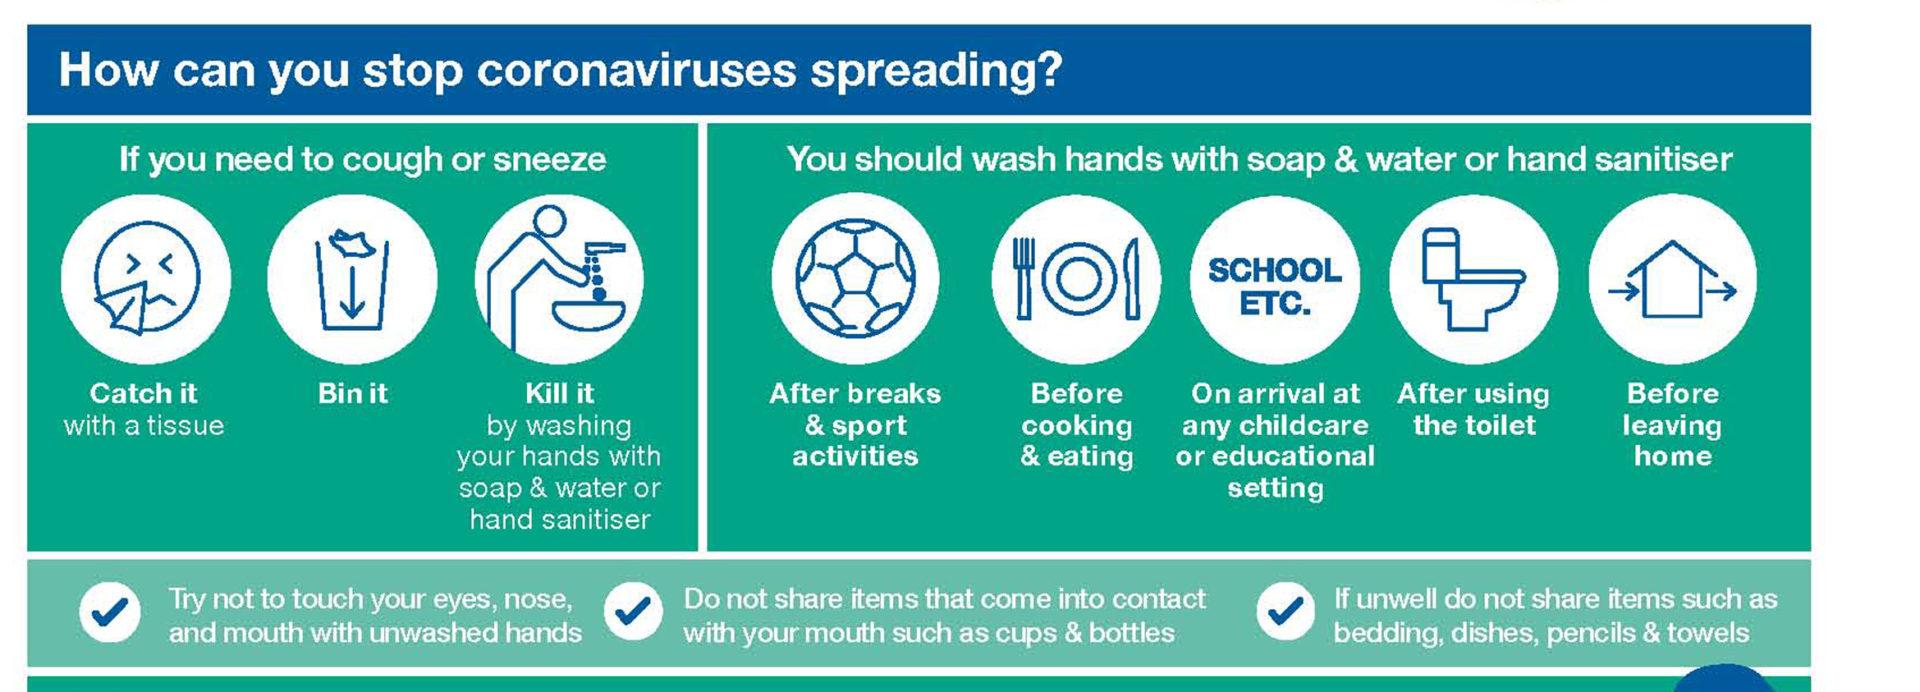 Public Health England advice coronavirus.